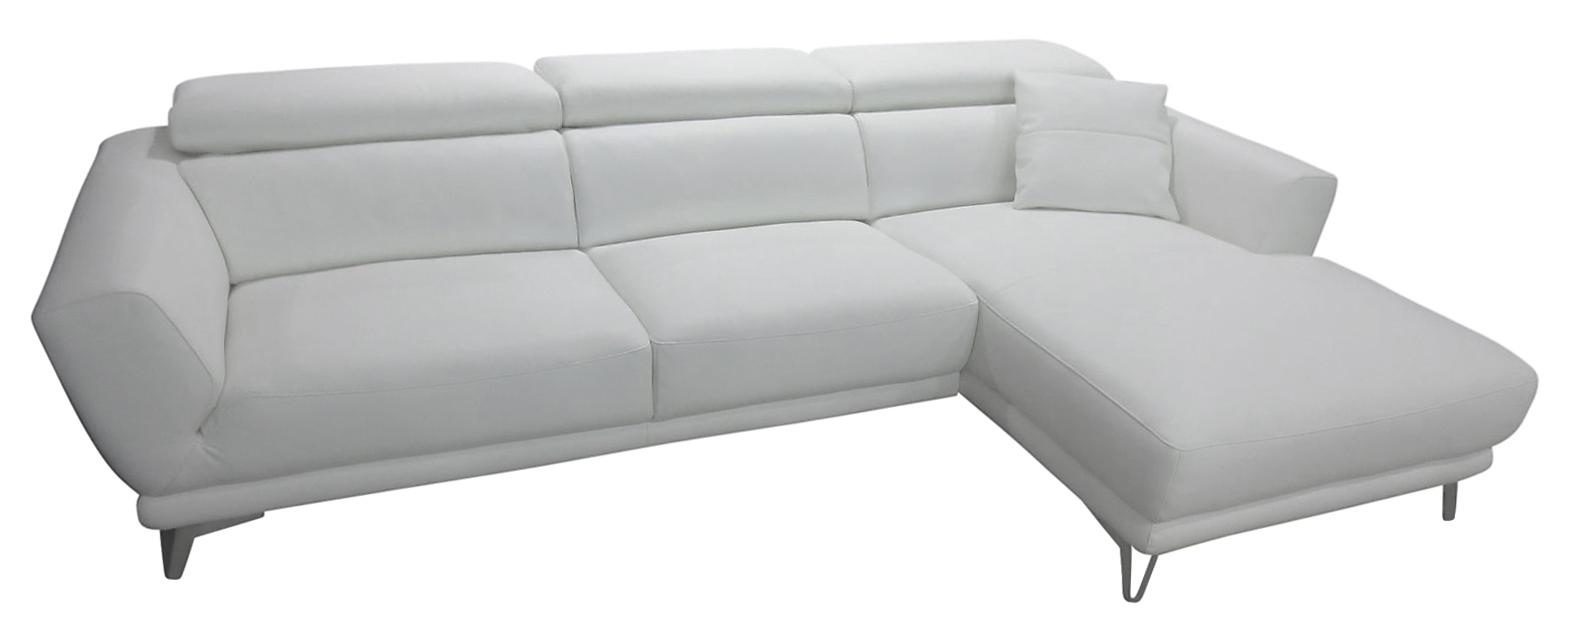 3e86b26efc7 Imola chaiselong hvid læder højrevendt, køb din nye Imola chaiselong ...